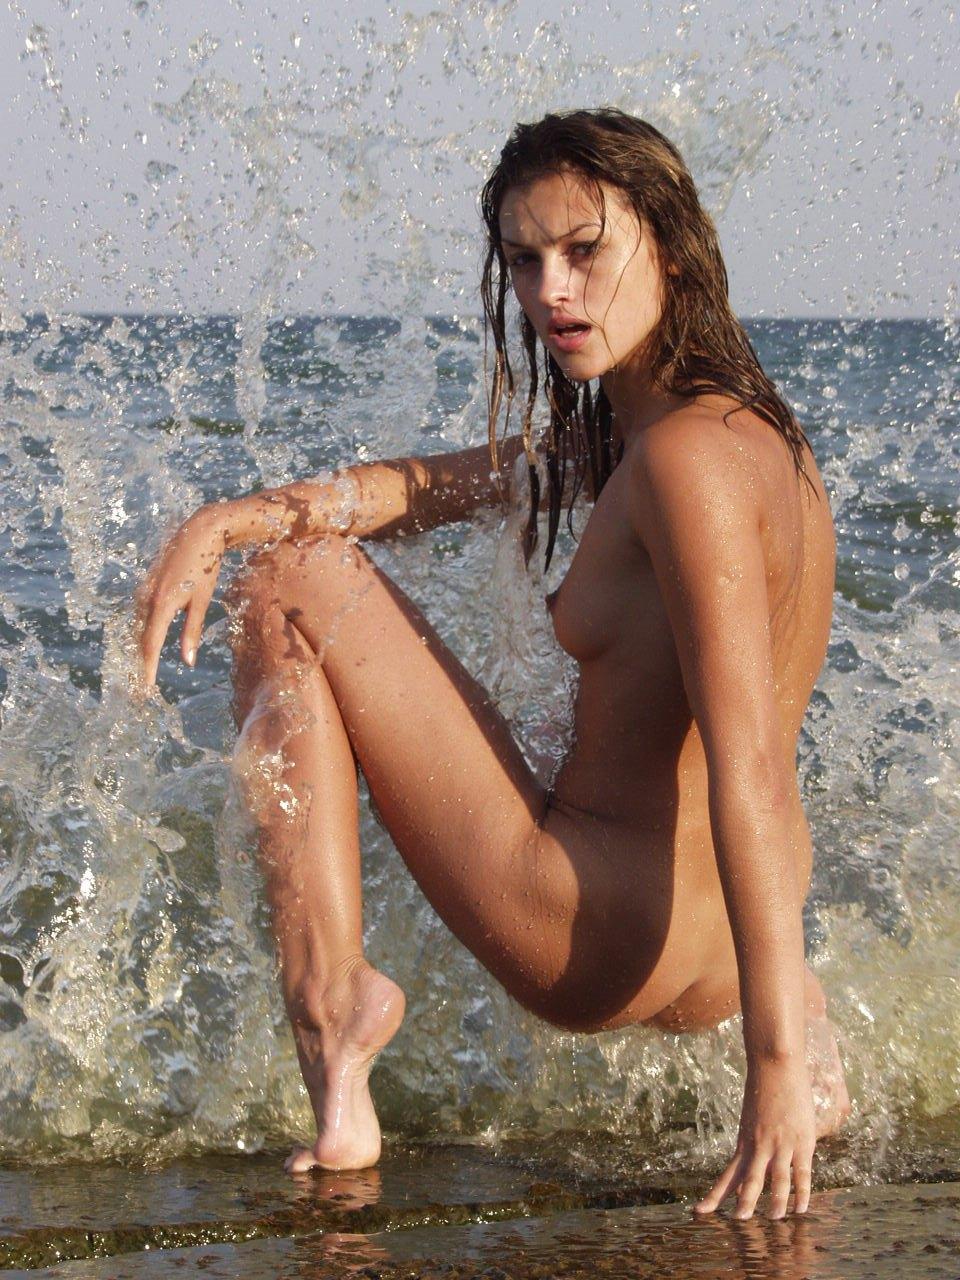 seaside-girls-13